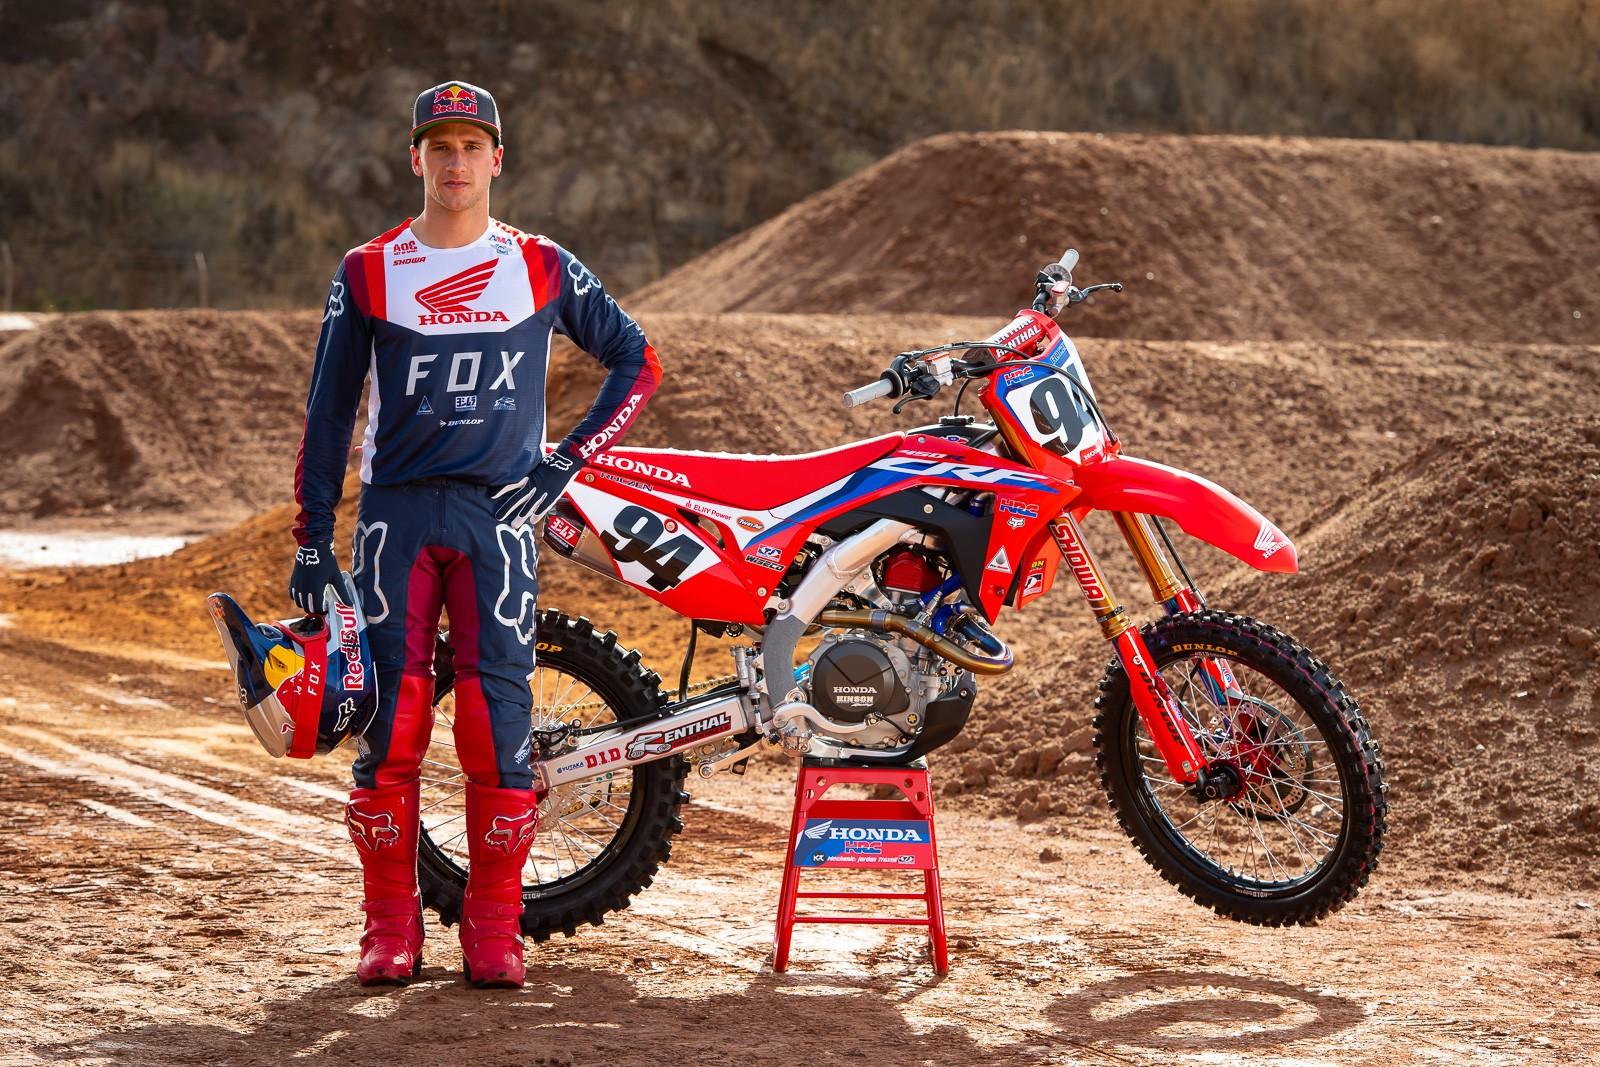 Ken Roczen - Team Honda HRC 2020 - Motocross Pictures - Vital MX